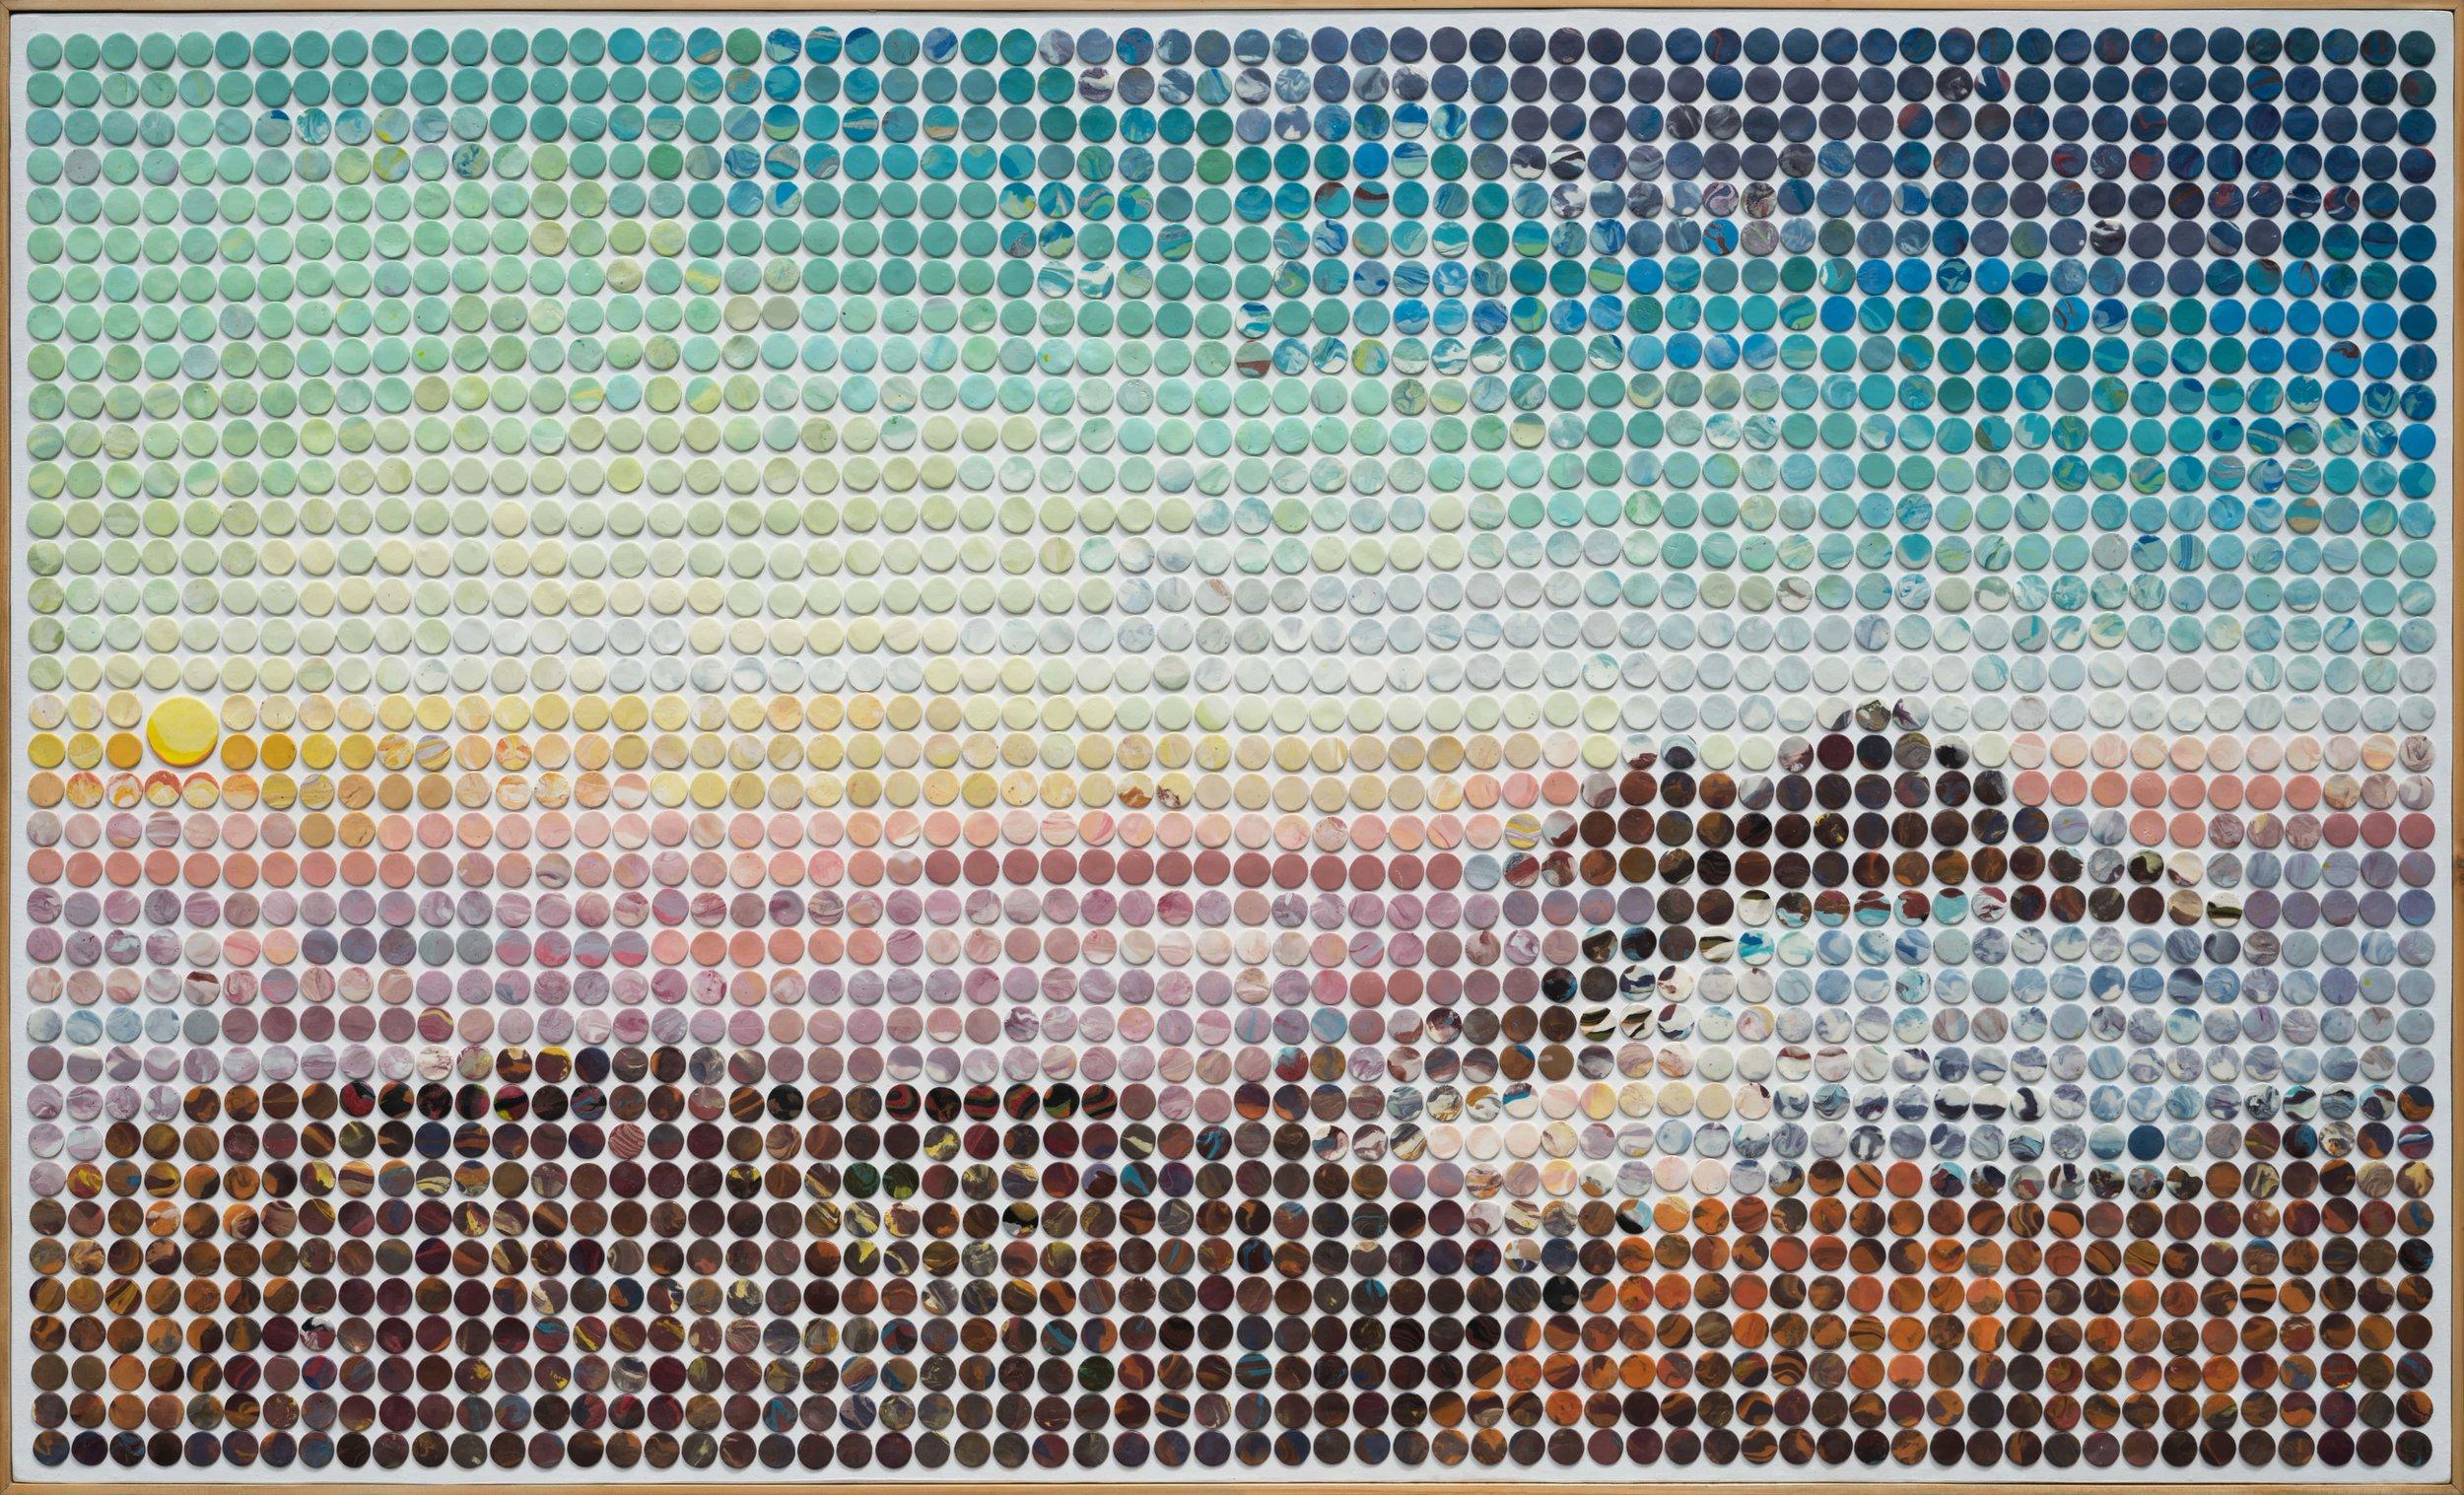 Dini Nur Aghnia, 'Sunrise at Prau', 2018, flour clay on canvas board, 200 x 120cm. Image courtesy of Gajah Gallery.